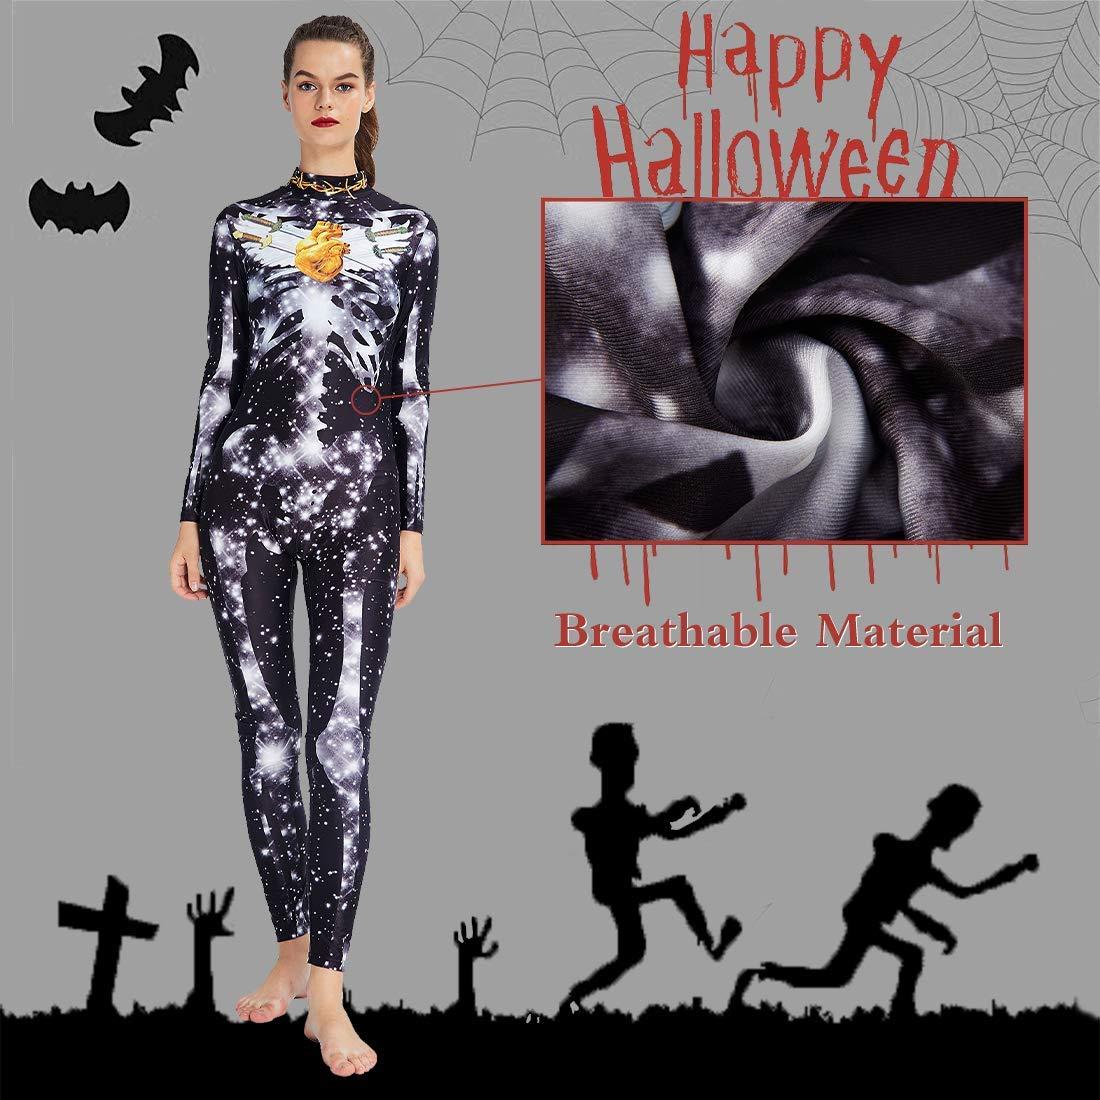 RAISEVERN Tuta da Notte Bianca con Stampa di Stelle Bianche Costume da Costume di Halloween Tuta per Donna Catsuit Manica Lunga Night Club Party